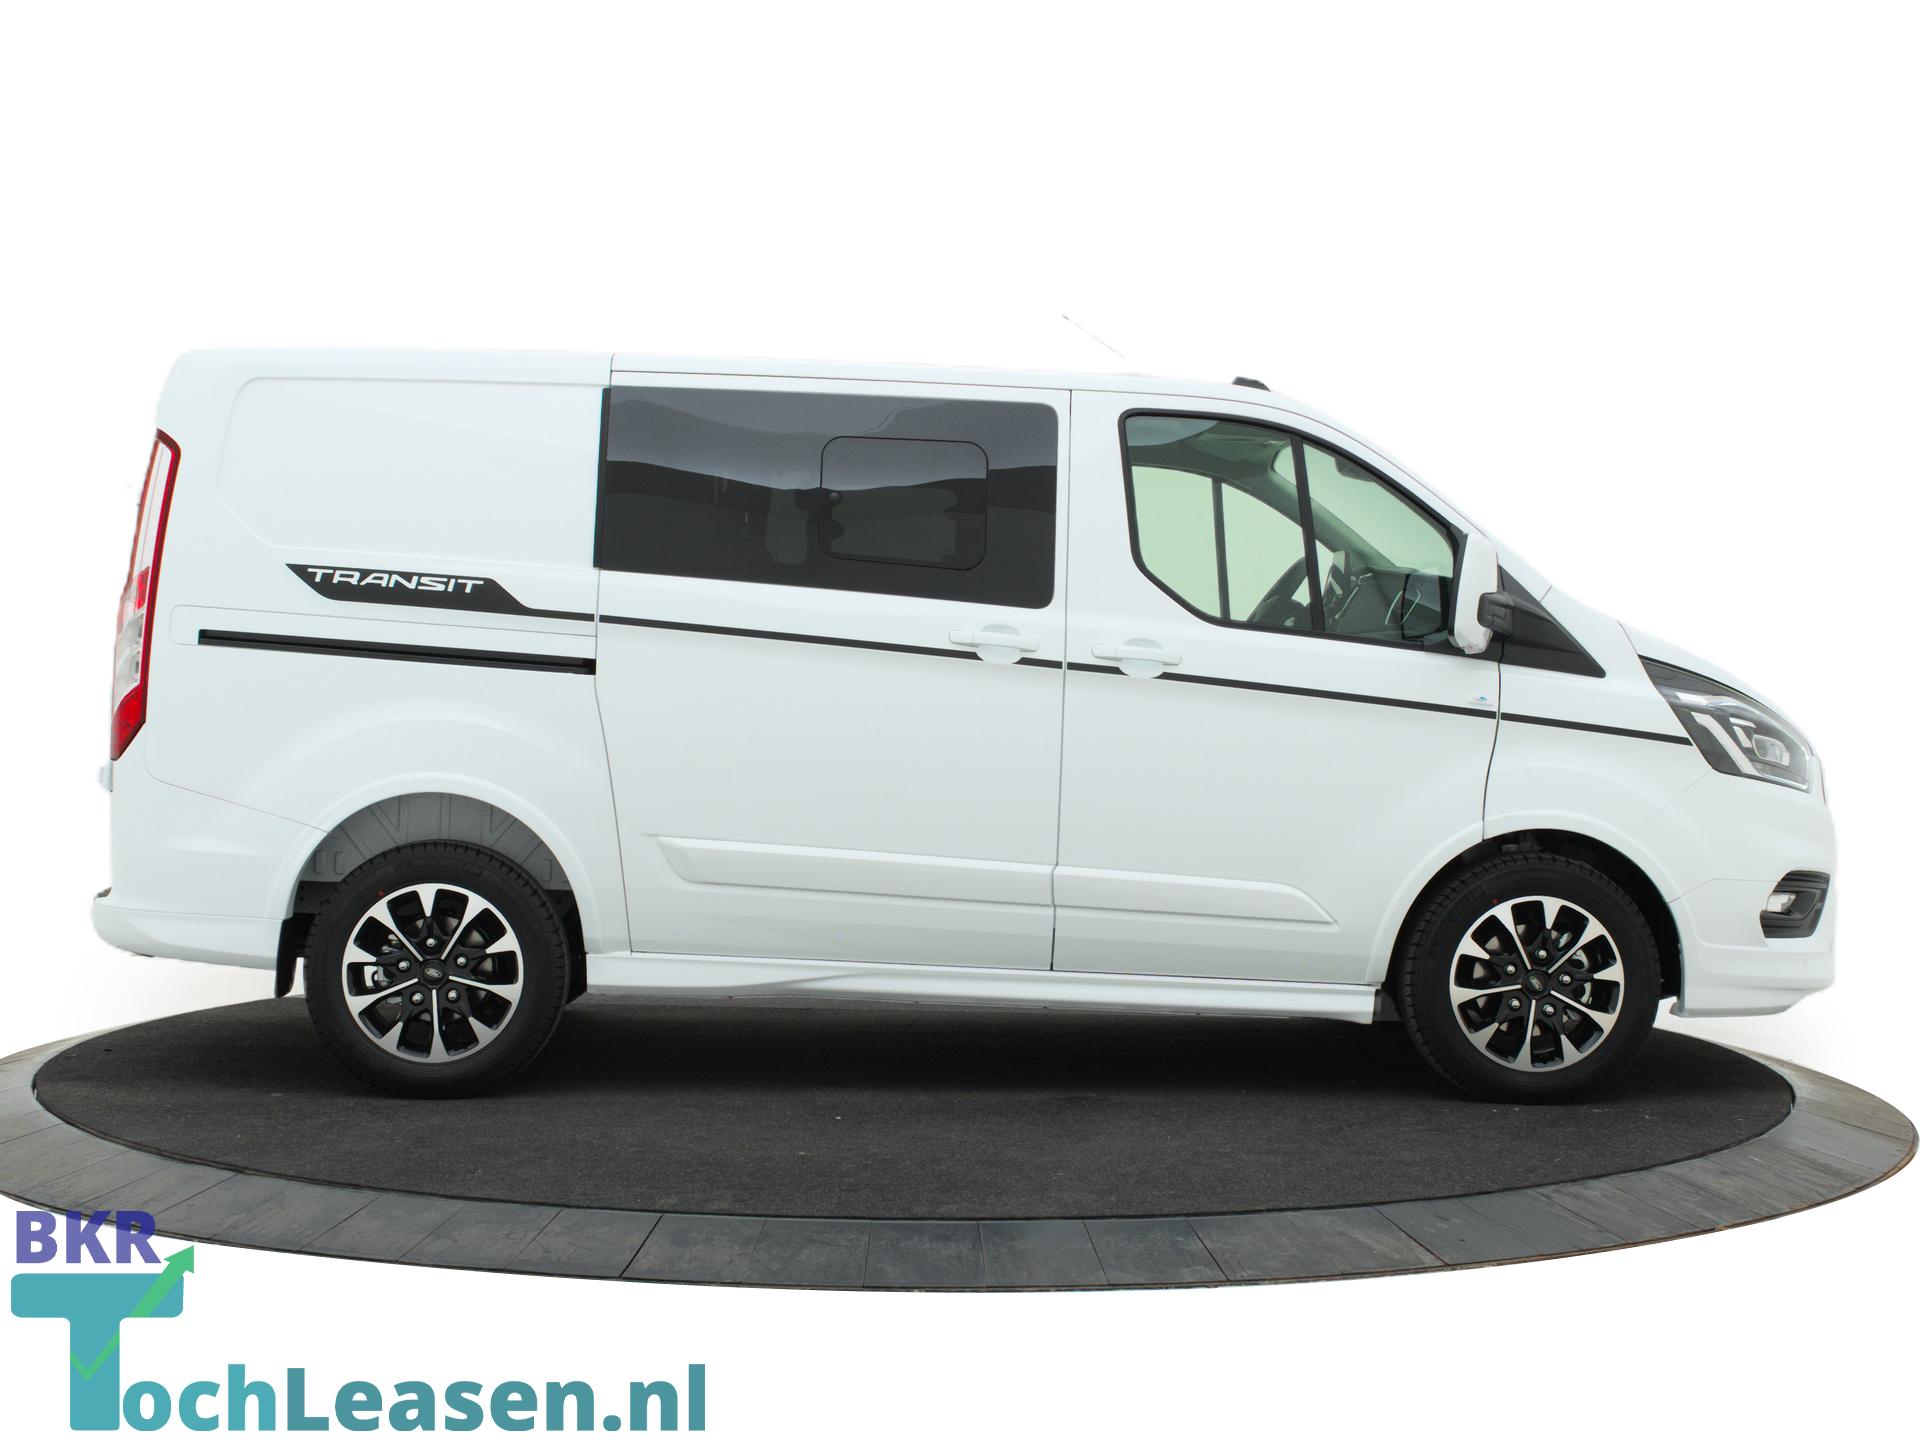 BKRtochleasen.nl - Ford Transit - Wit sport